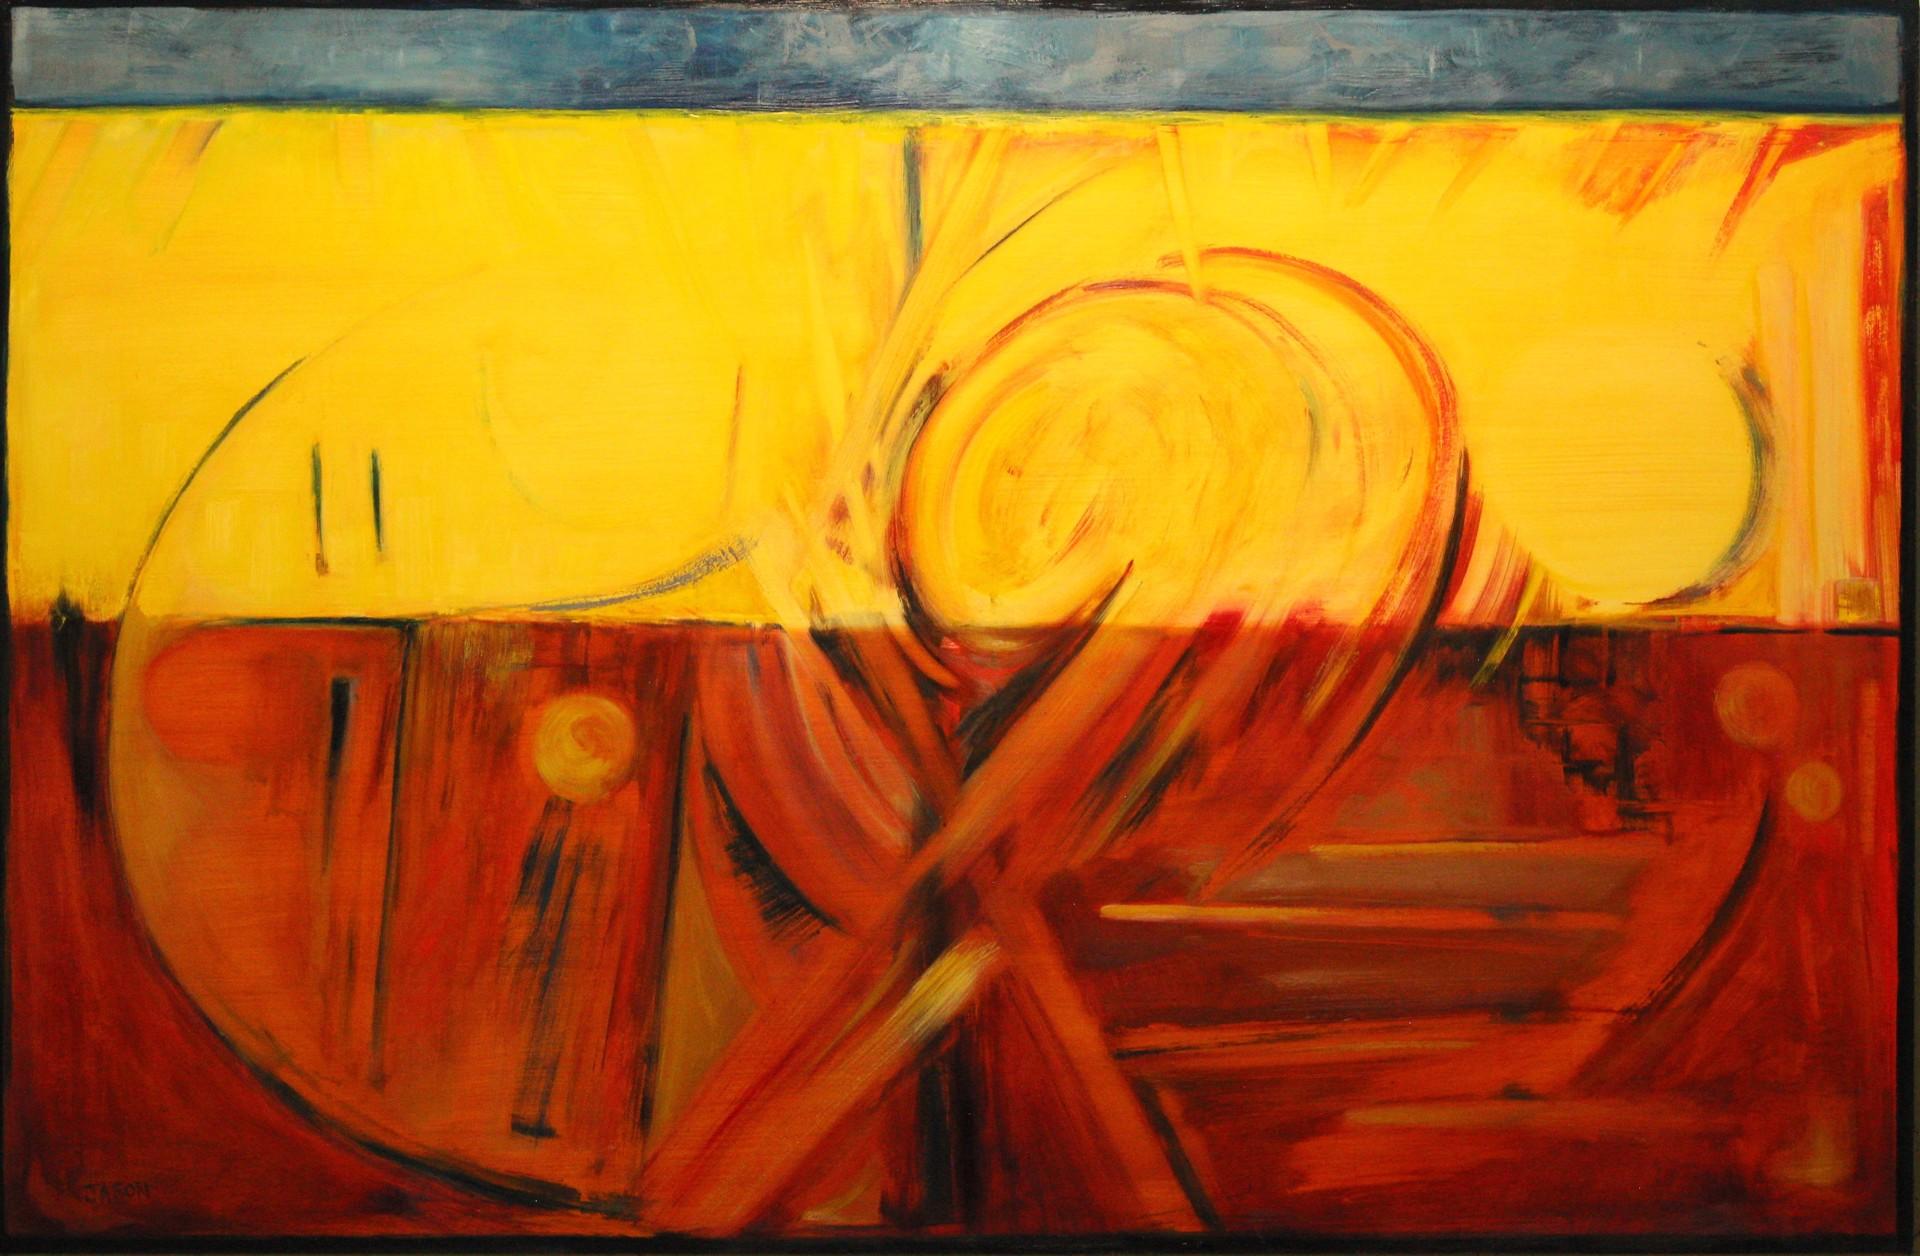 Circle Swirl Swirl by Jason Berrier (Newberg, OR)